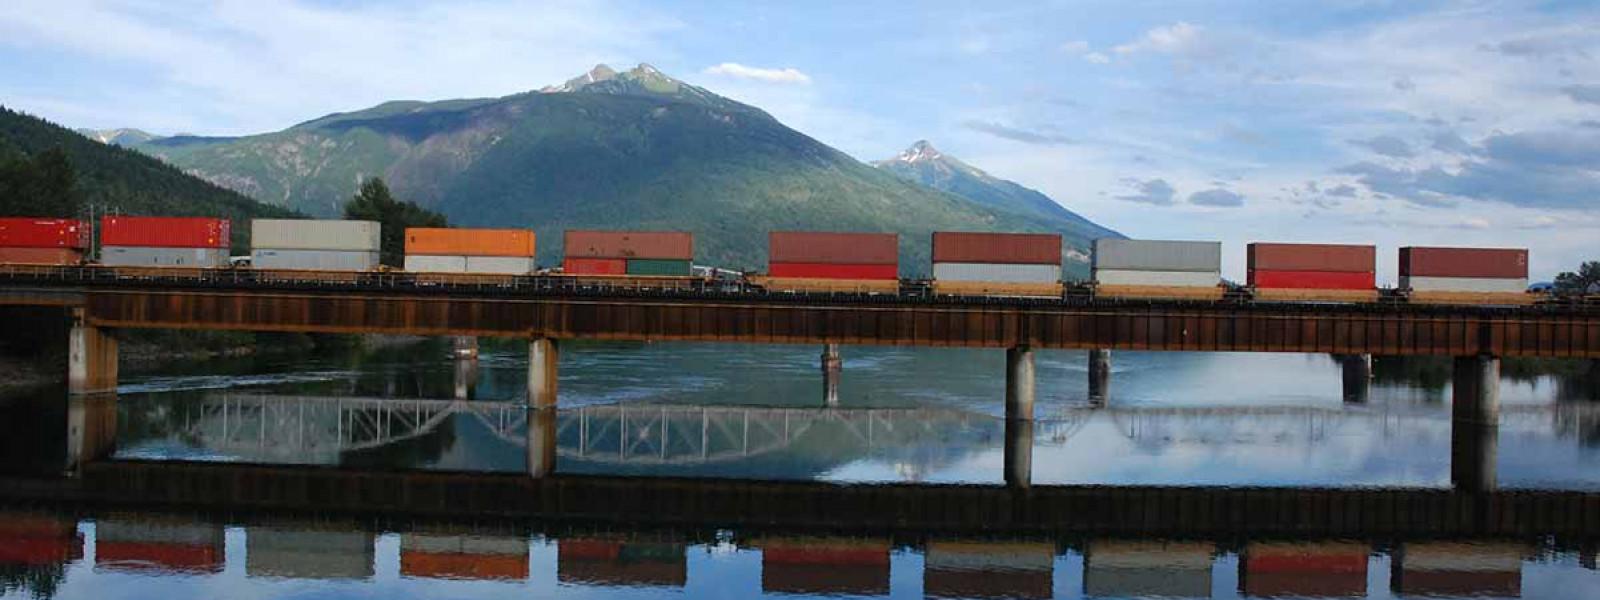 Canadian-train-on-a-railwaybridge-507718008_3872x2592